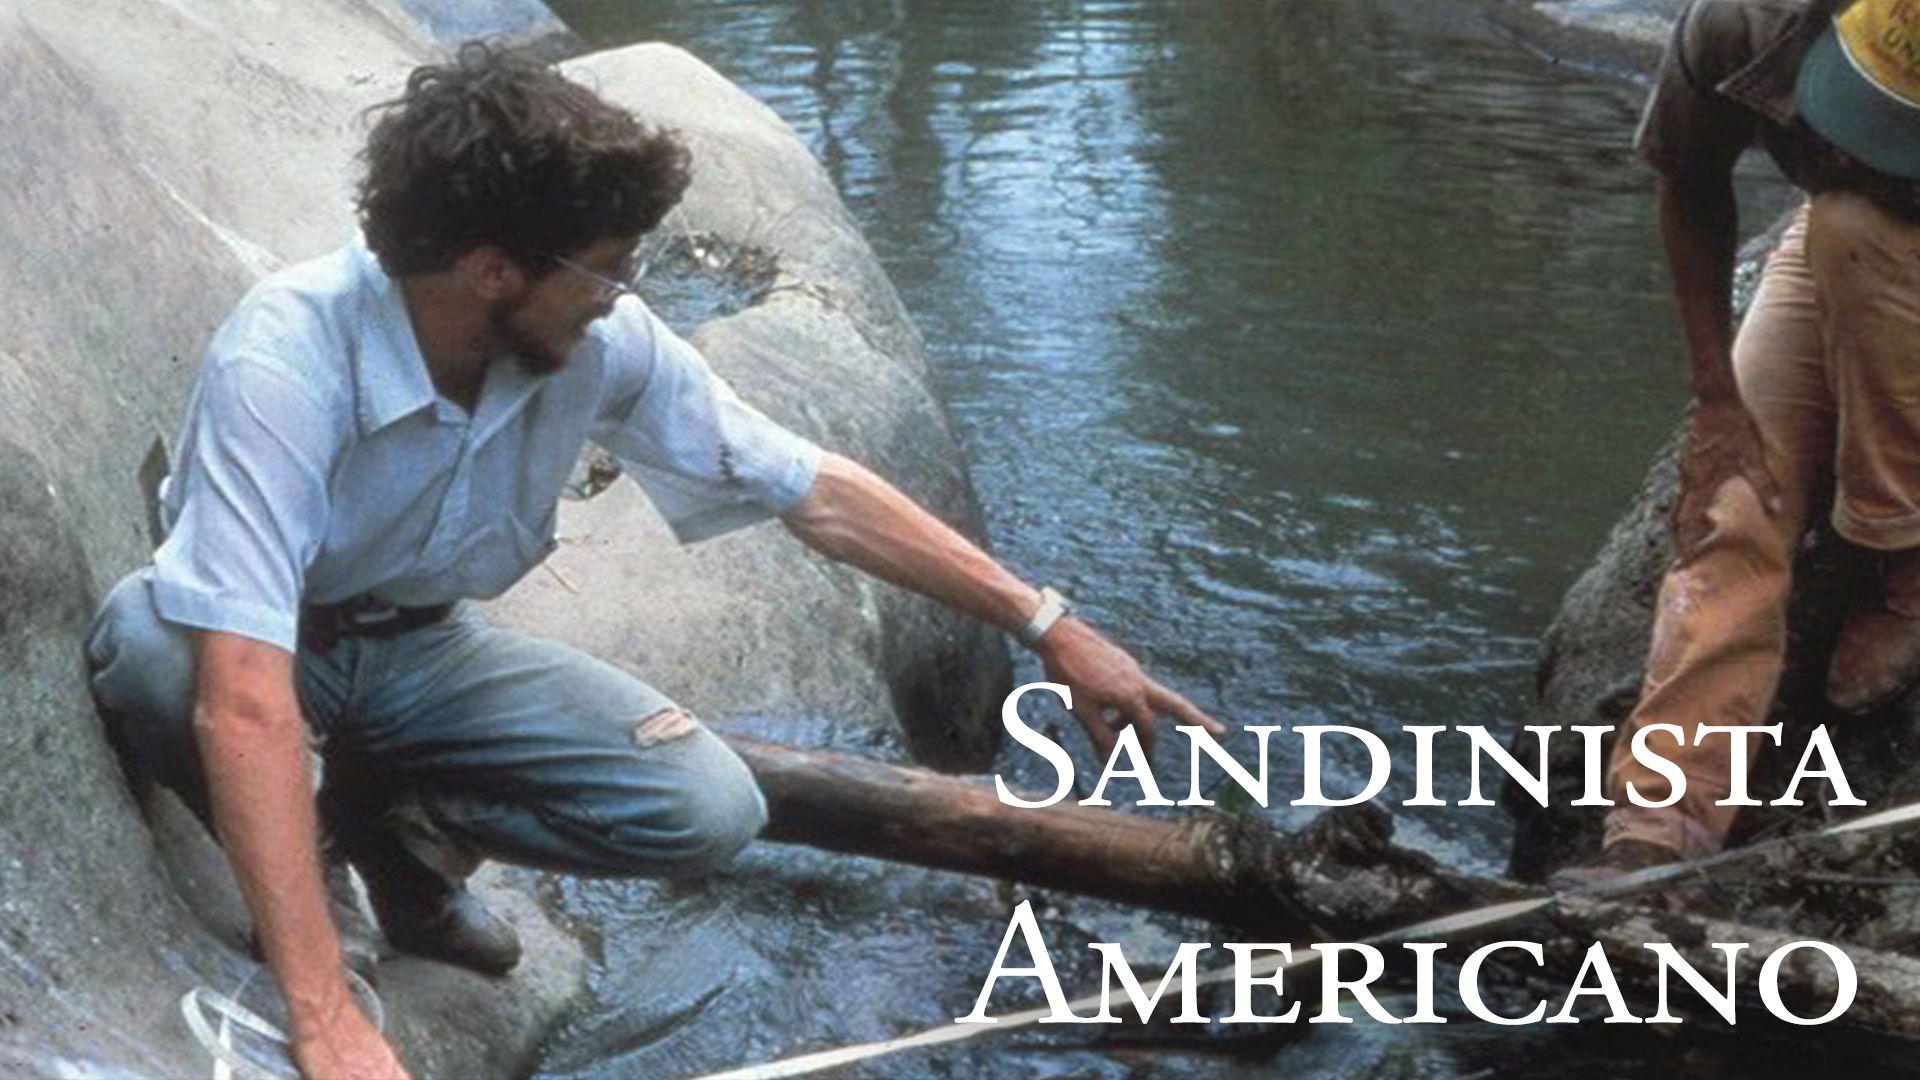 Sandinista Americano